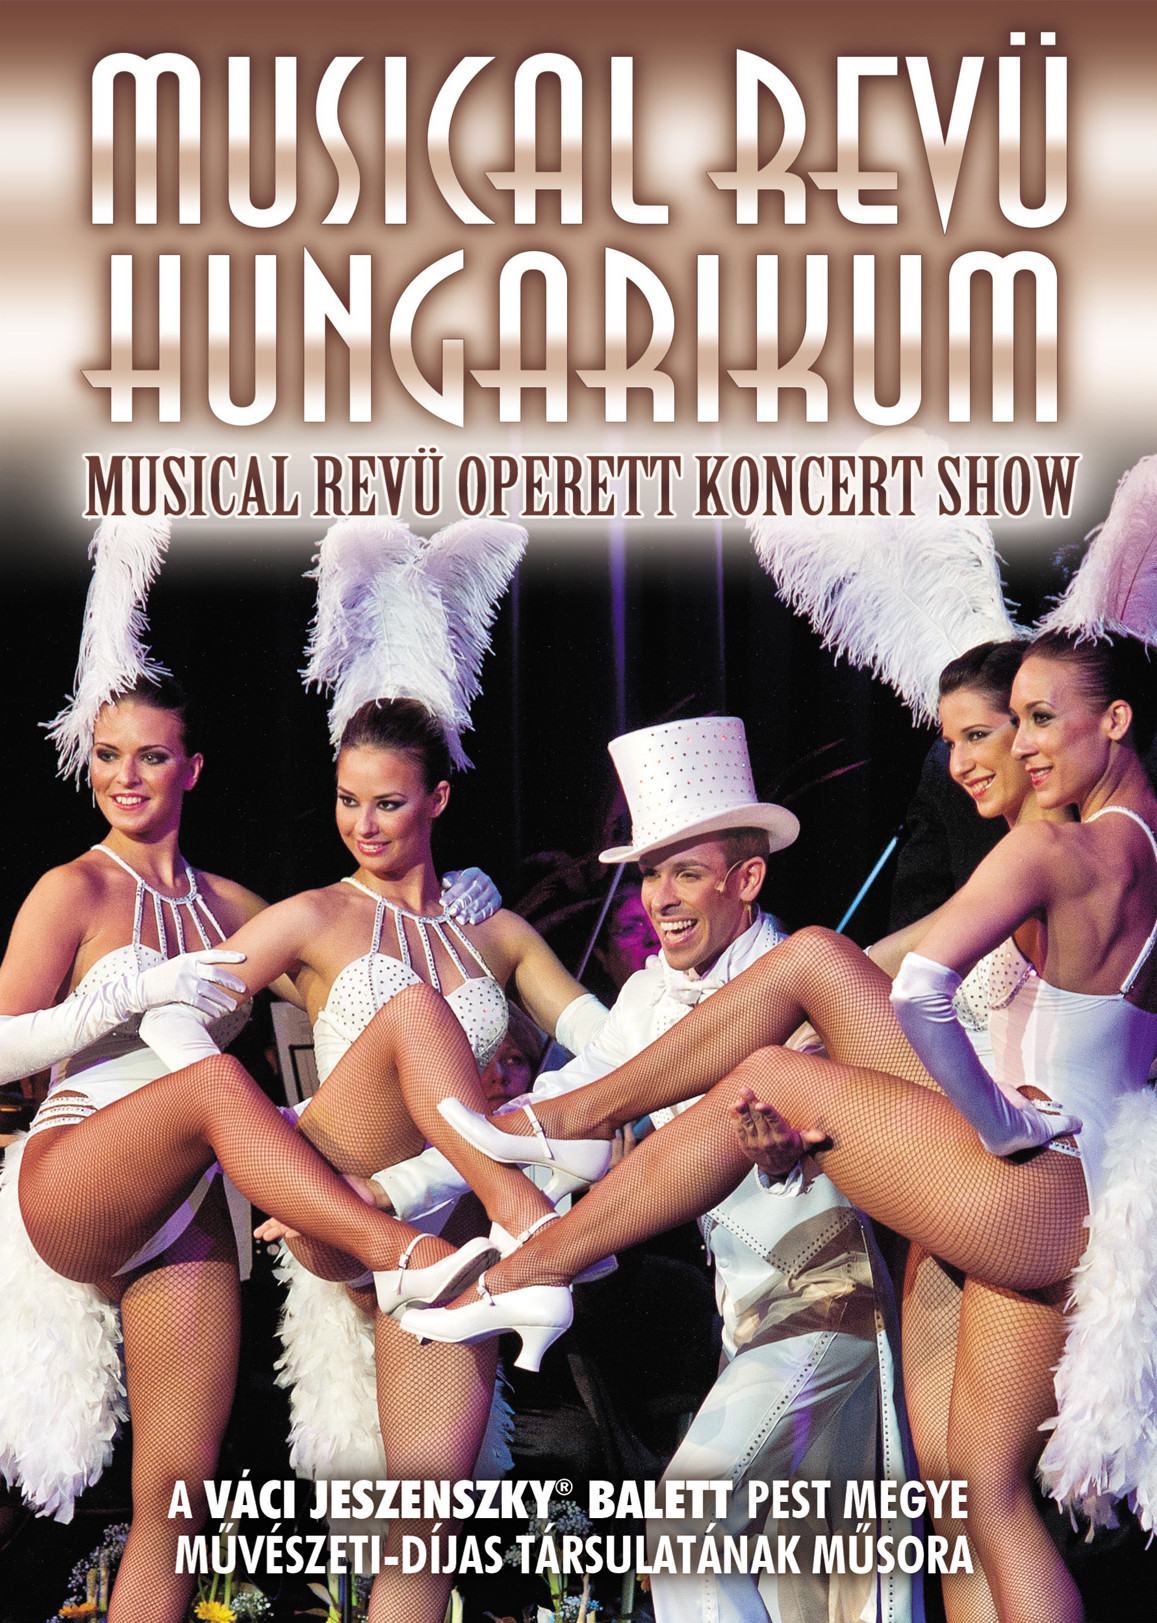 jeszenszky-vaci-balett-musical-revu-hungarikum